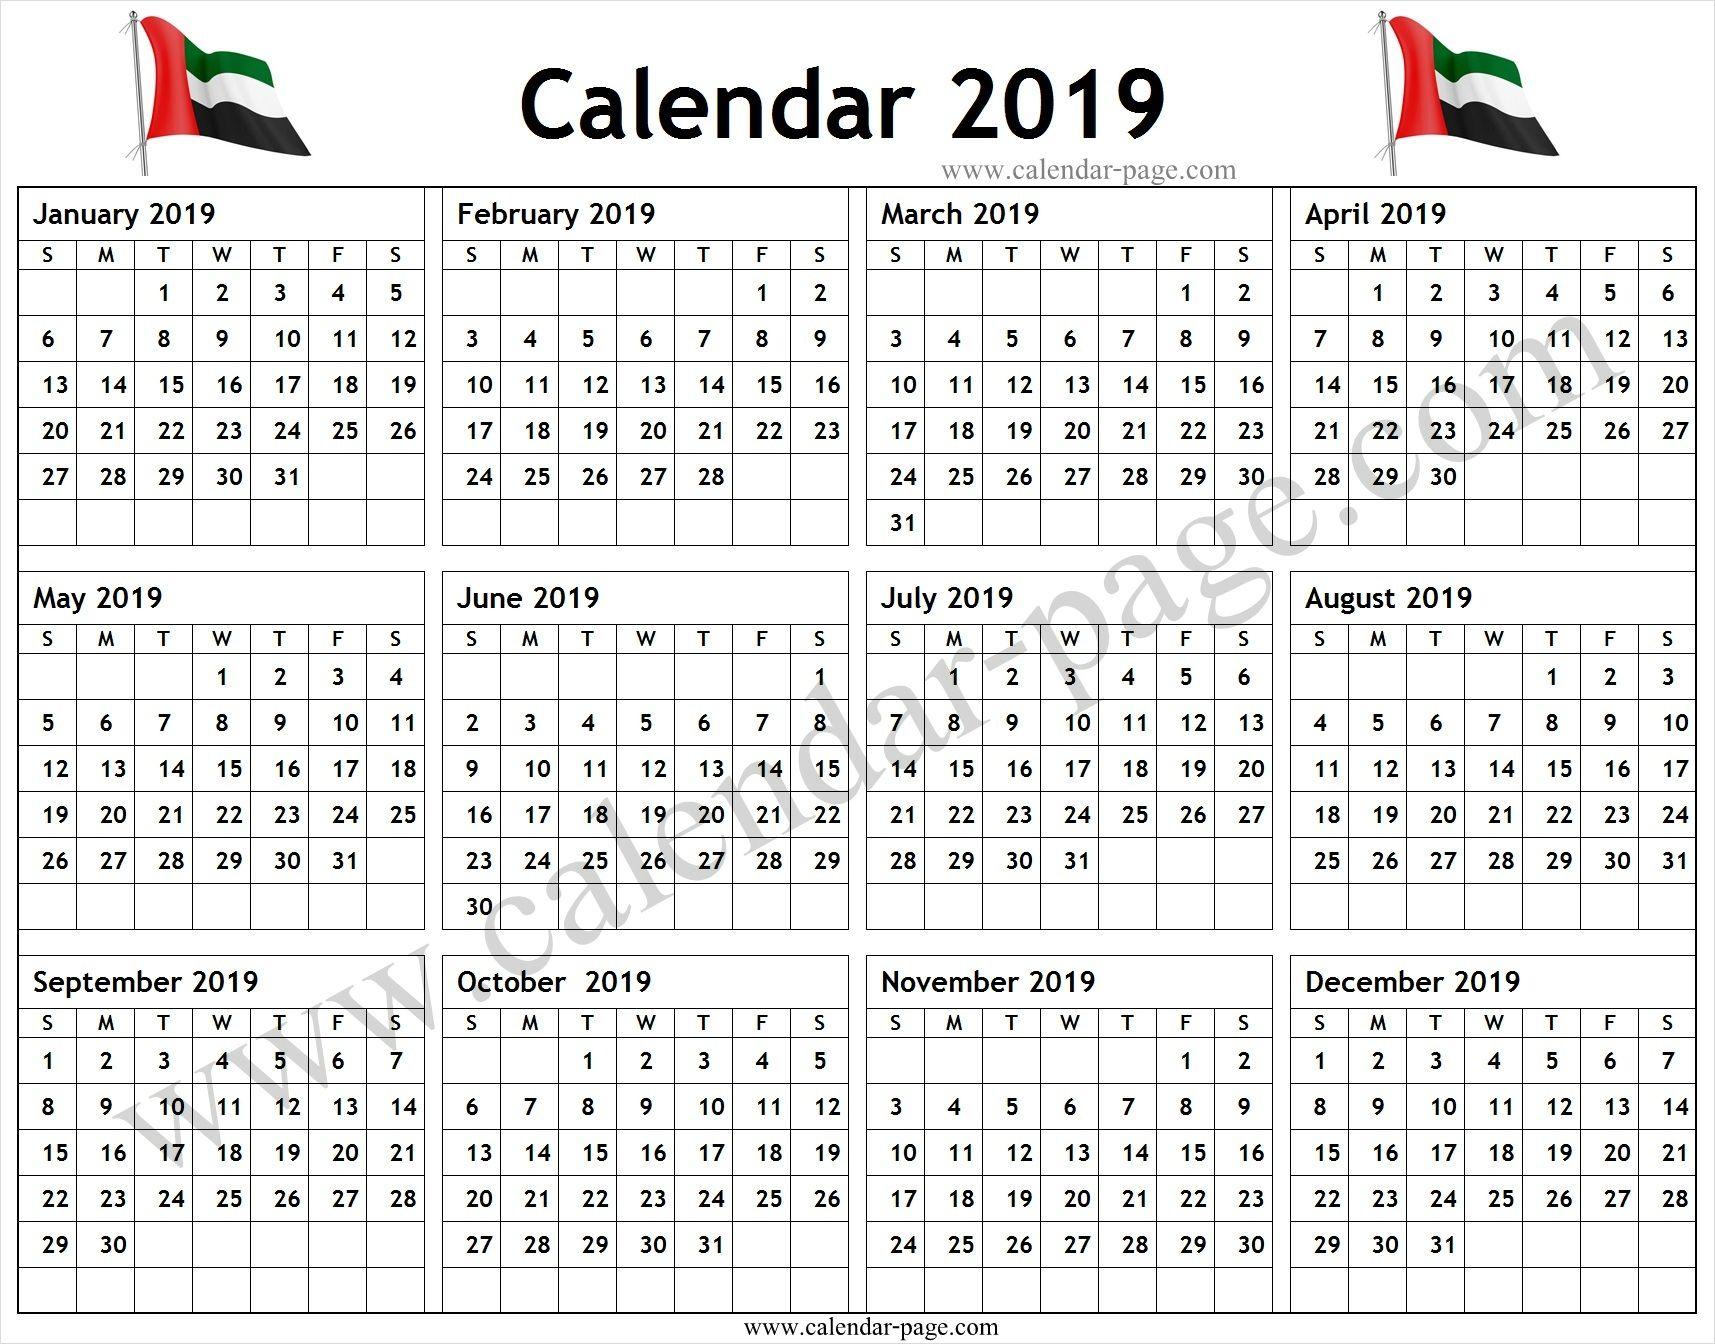 Calendar 2019 Uae Pdf Blank Calendar 2019 Template Calendar